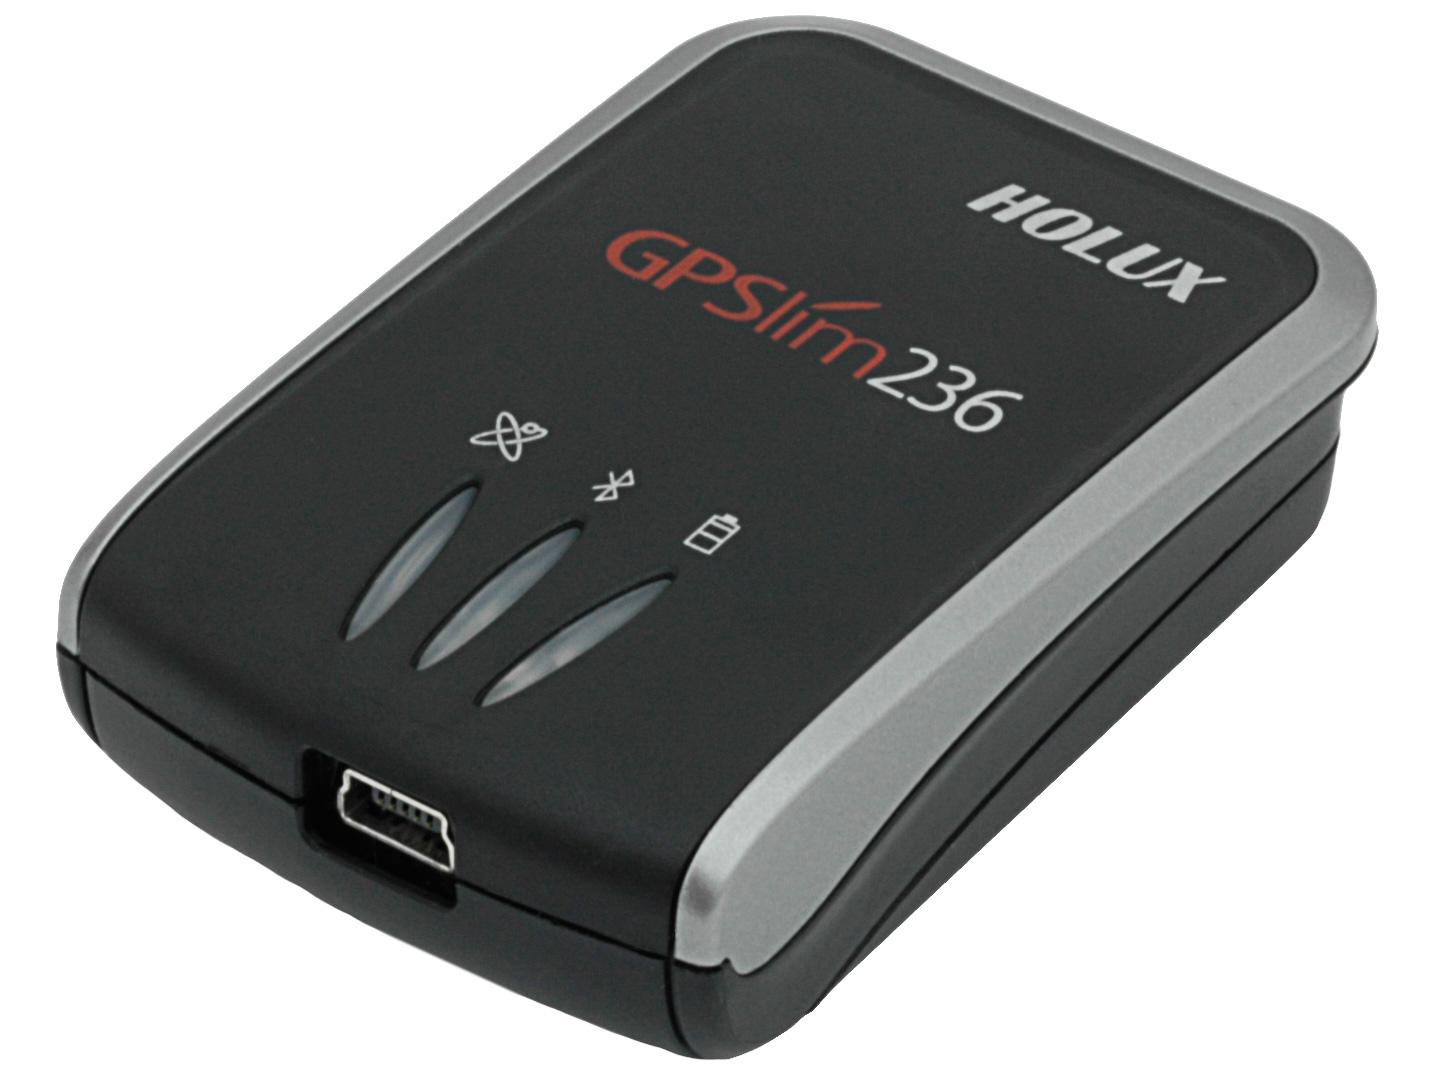 Holux GR-236 / GPSlim 236 - mini USB